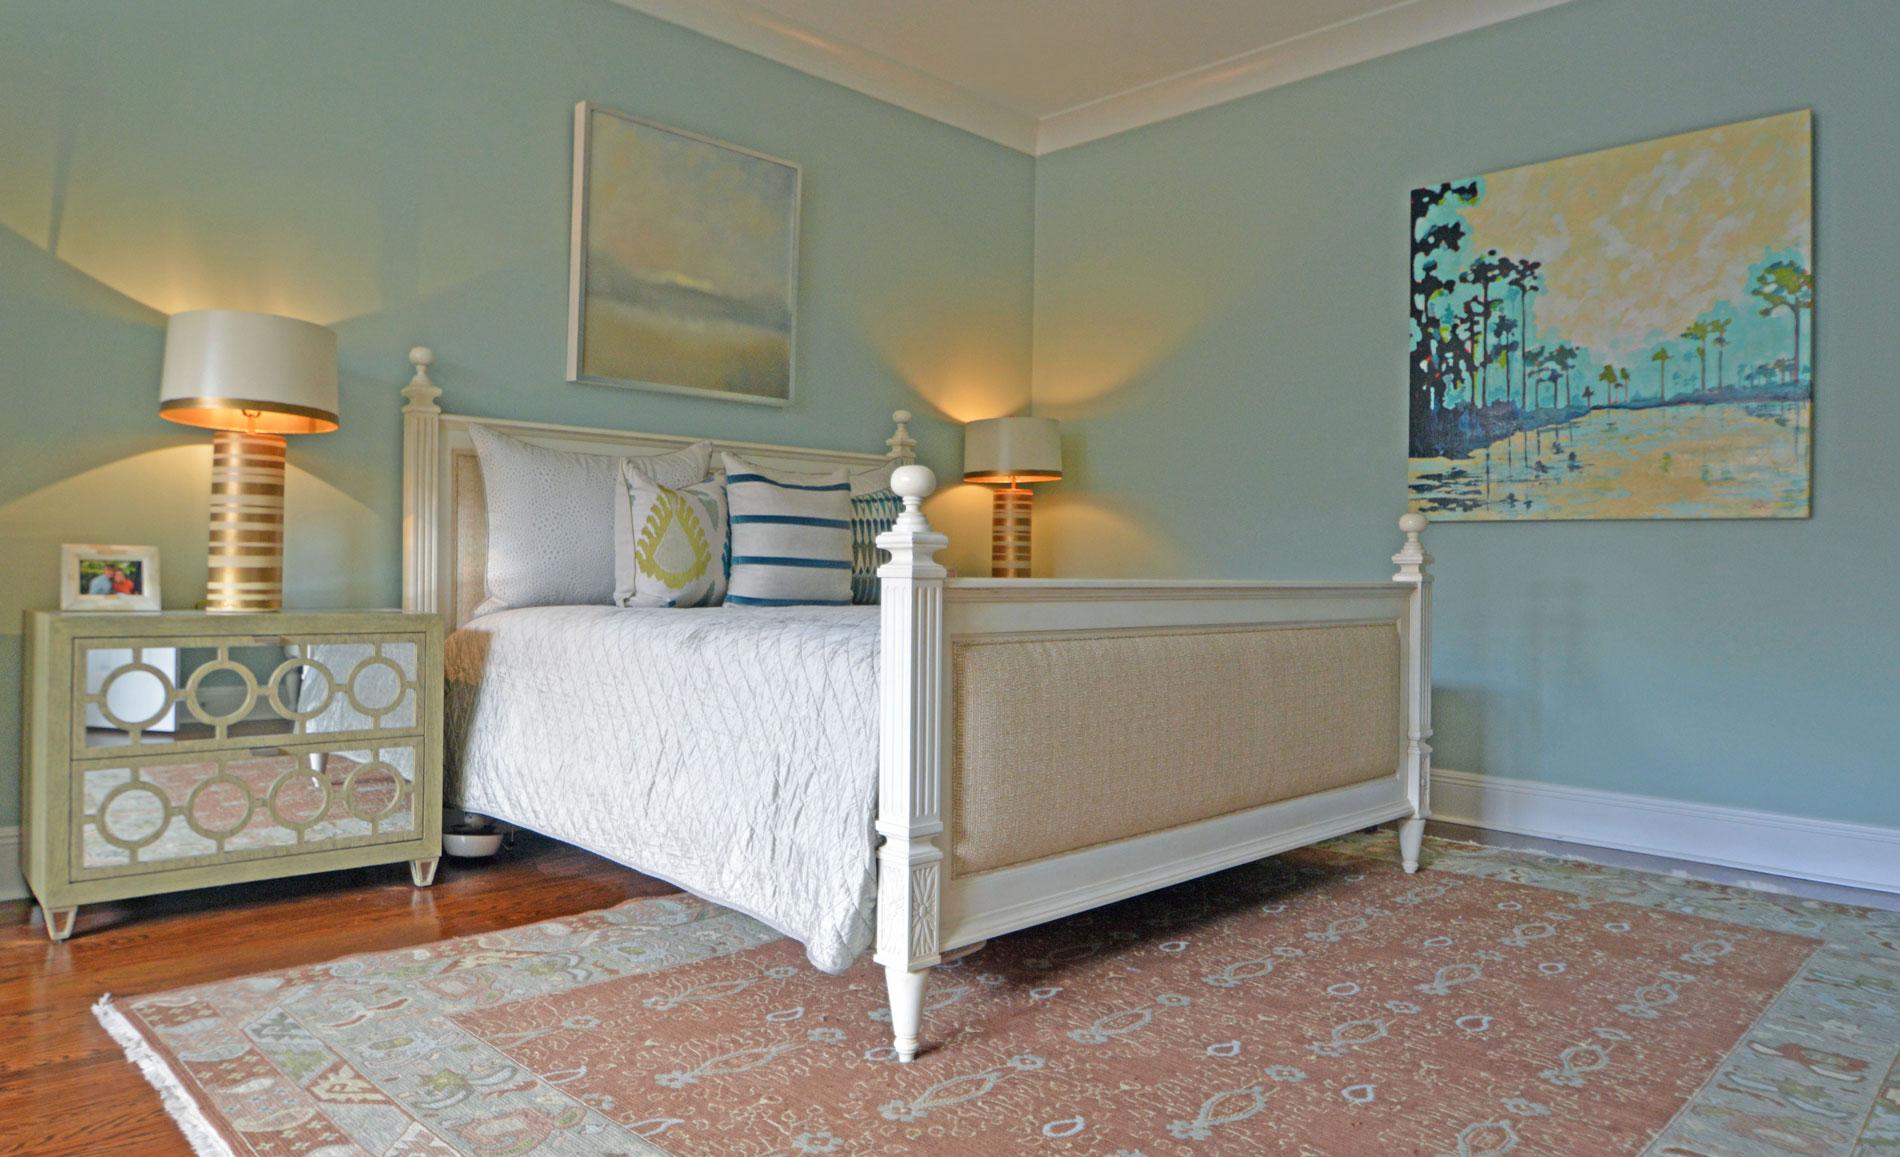 fawley-david2-dixon-smith-interiors-baton-rouge-interior-design-custom-furniture-web-0014